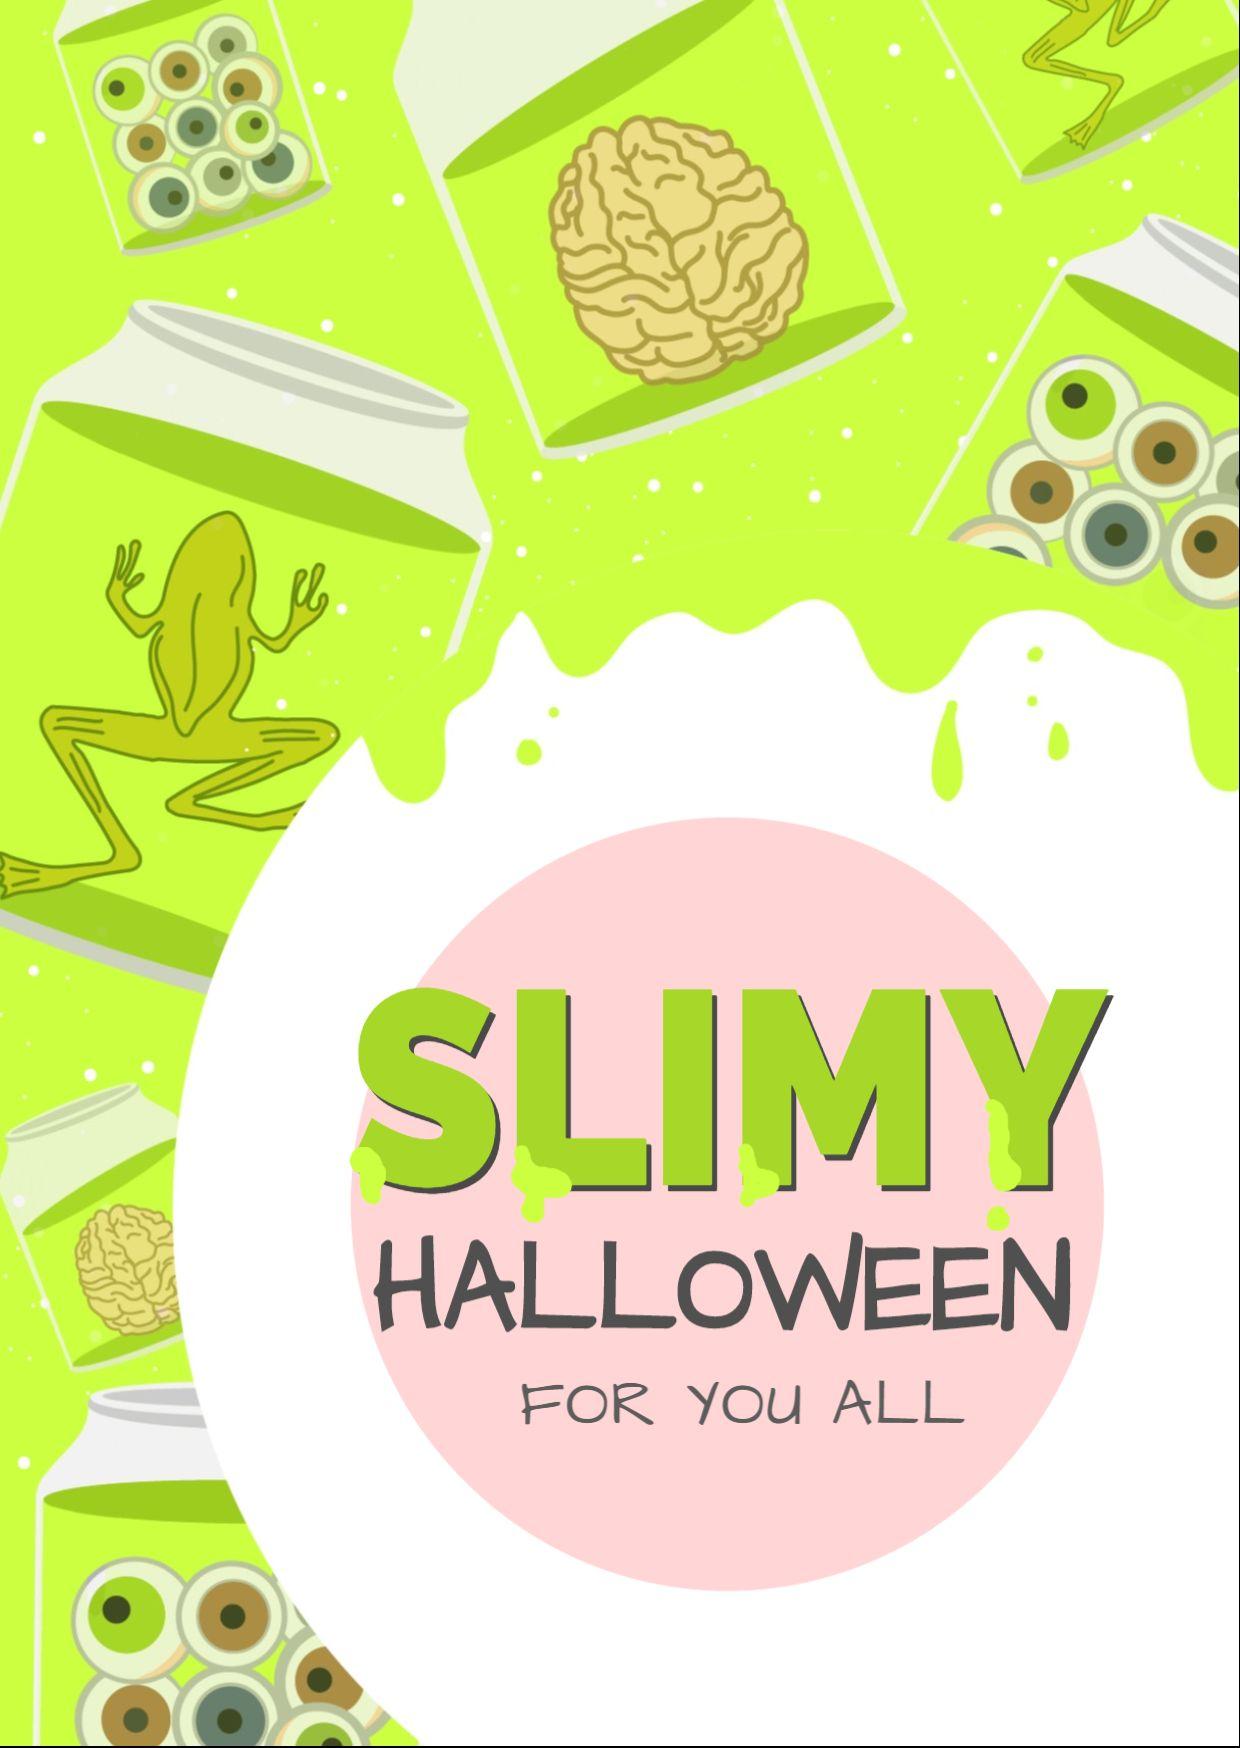 Slimy Halloween Greeting Card Template